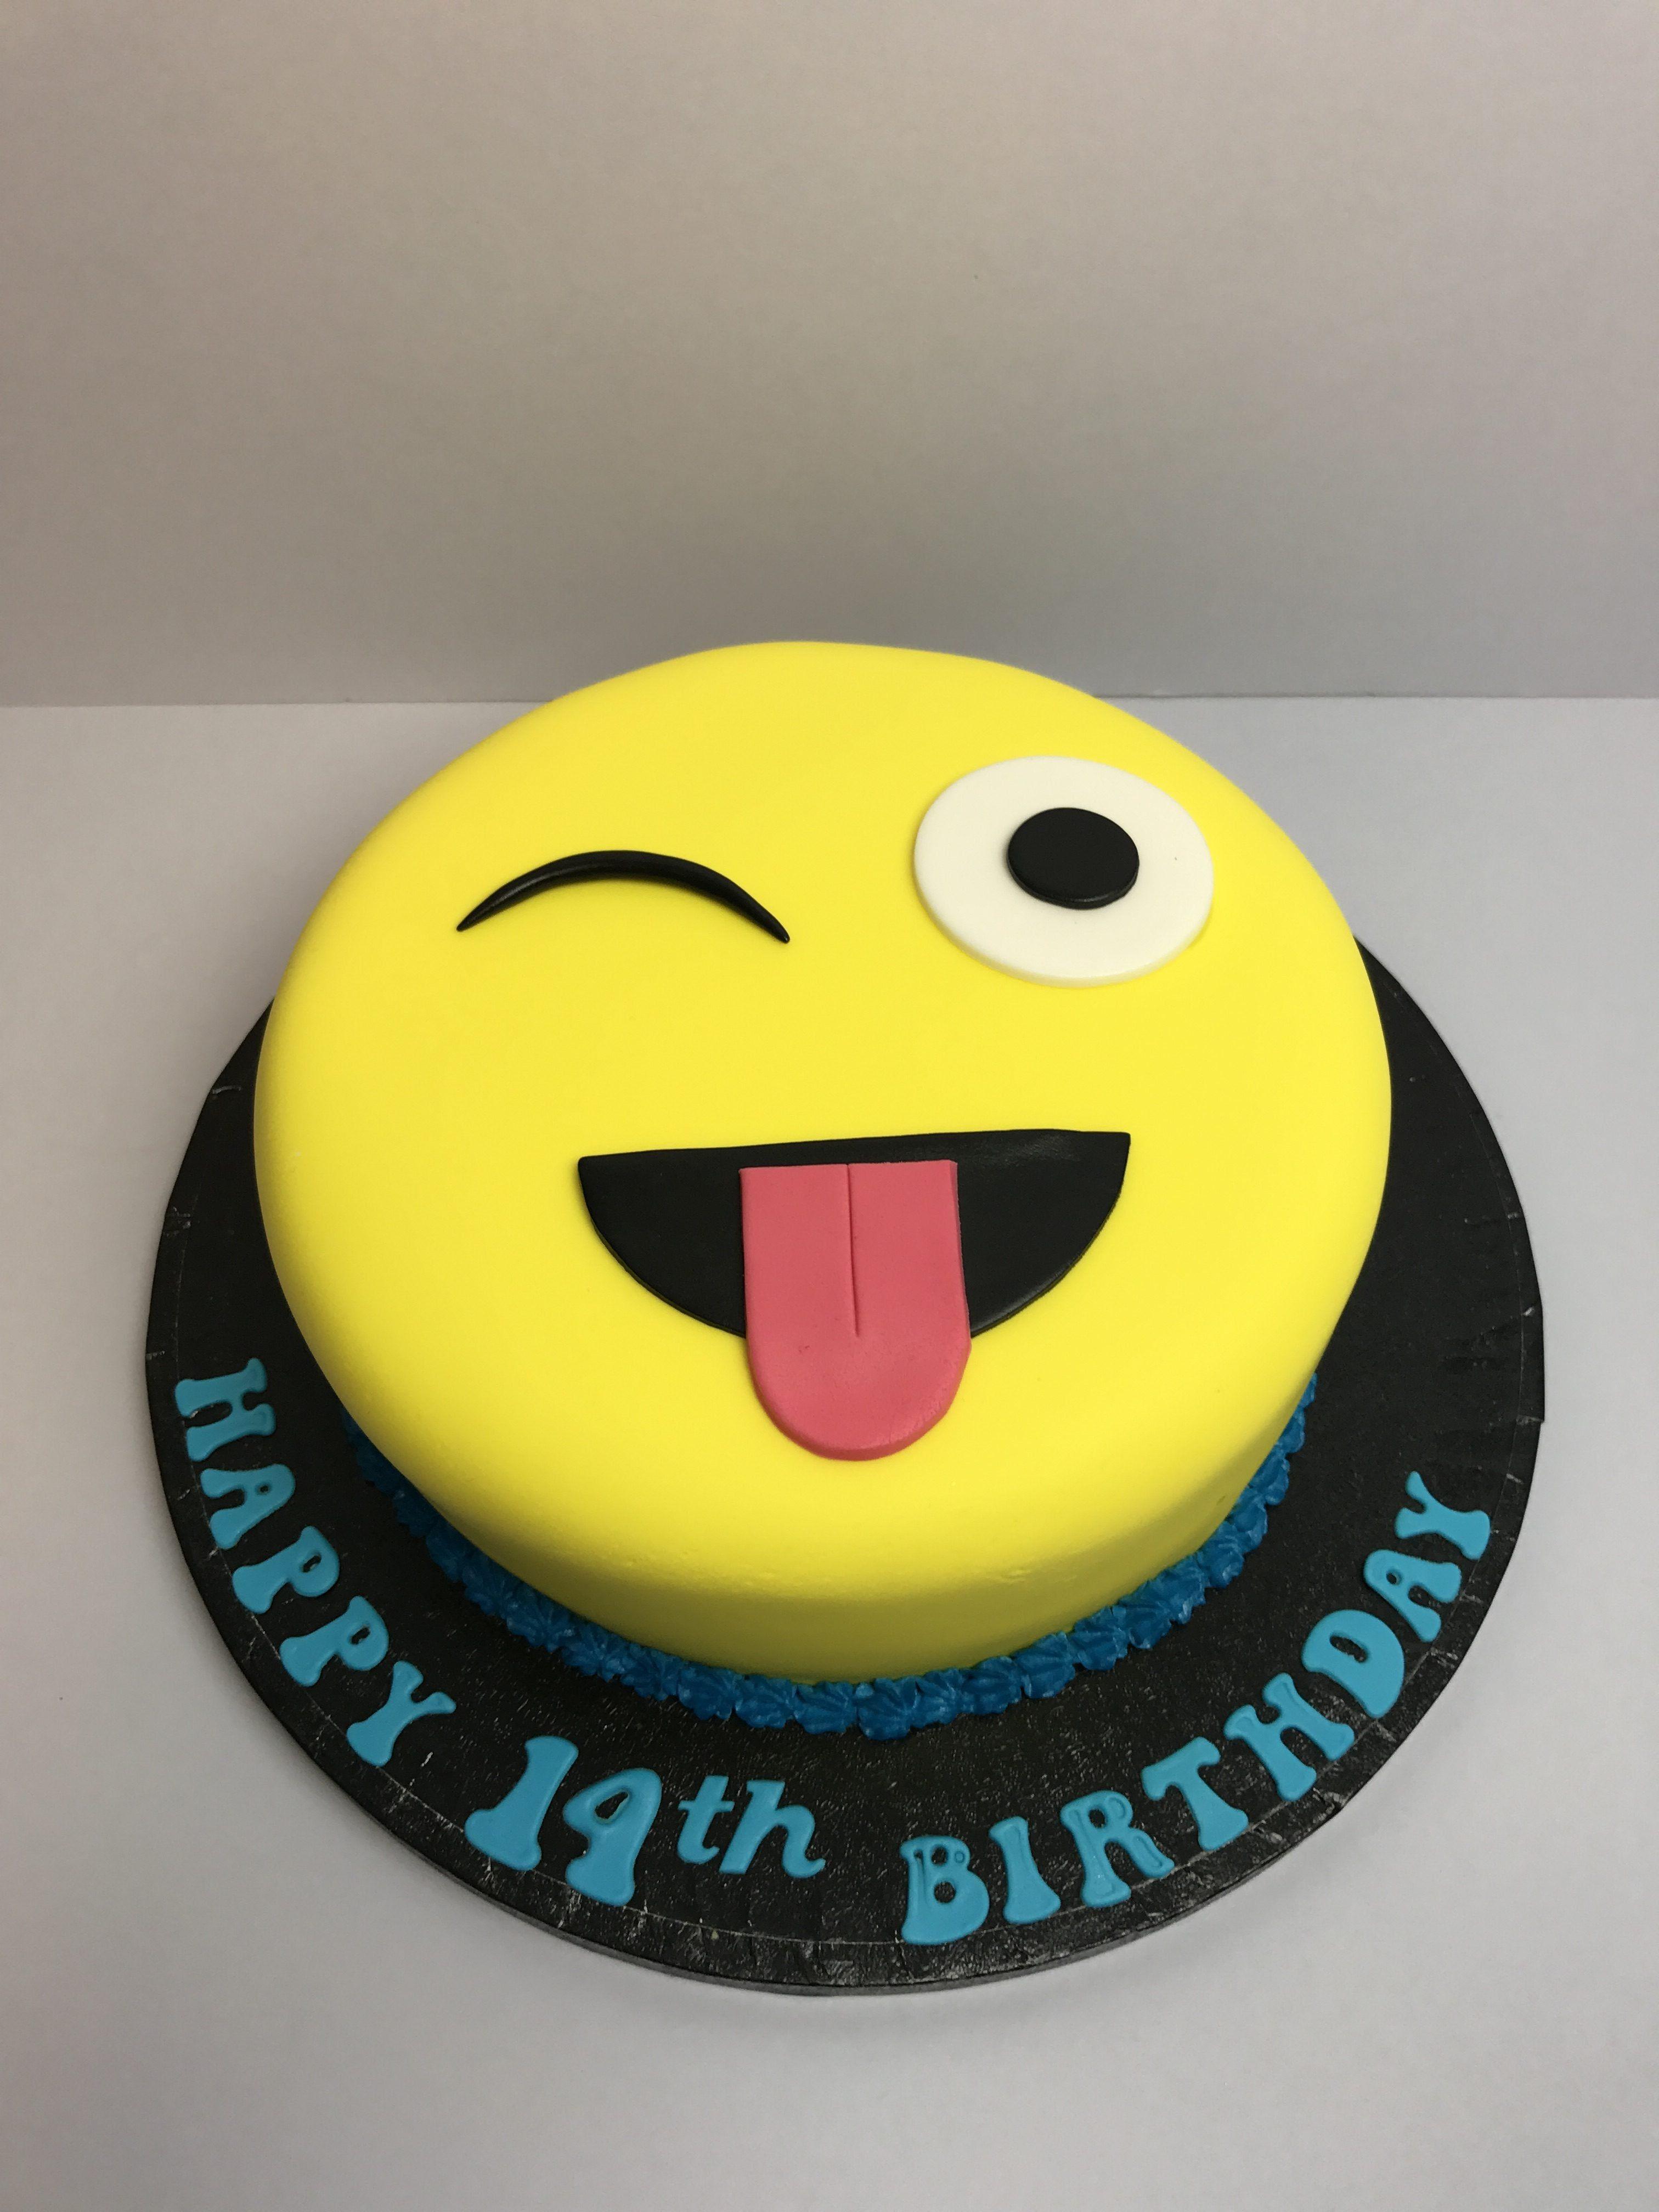 Emoji Cakes Birthday Cake Shop Handmade Cakes Designed Baked